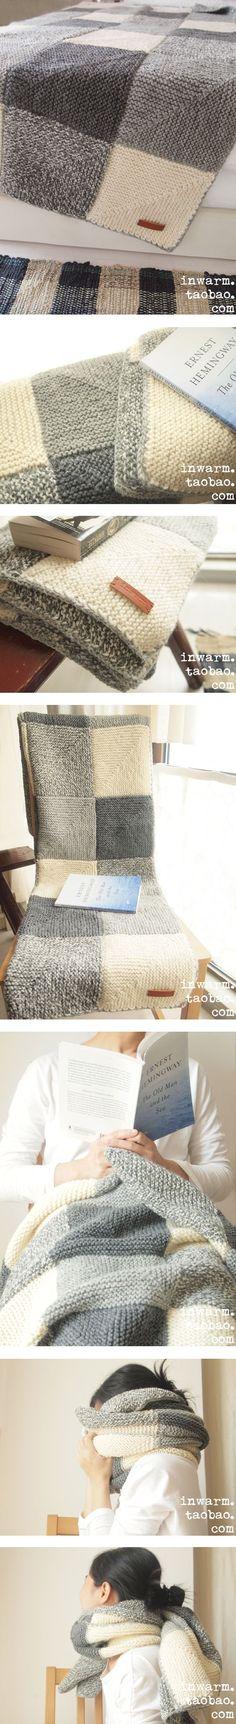 crochet blanket/hand crocheted blankets/crochet patterns blanket/crocheted (picture)